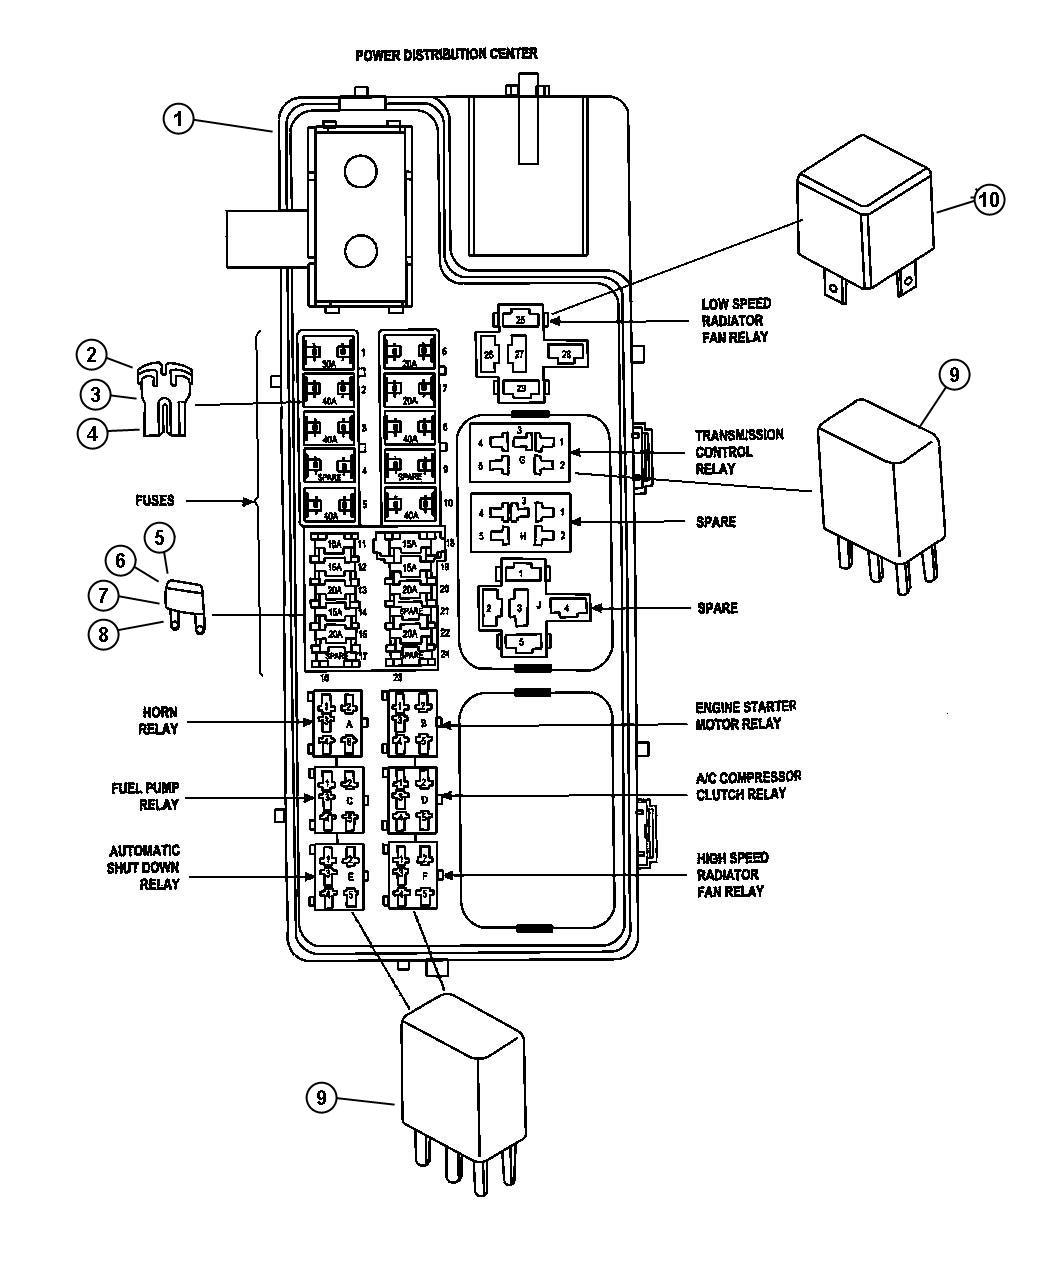 hight resolution of pt cruiser diagram